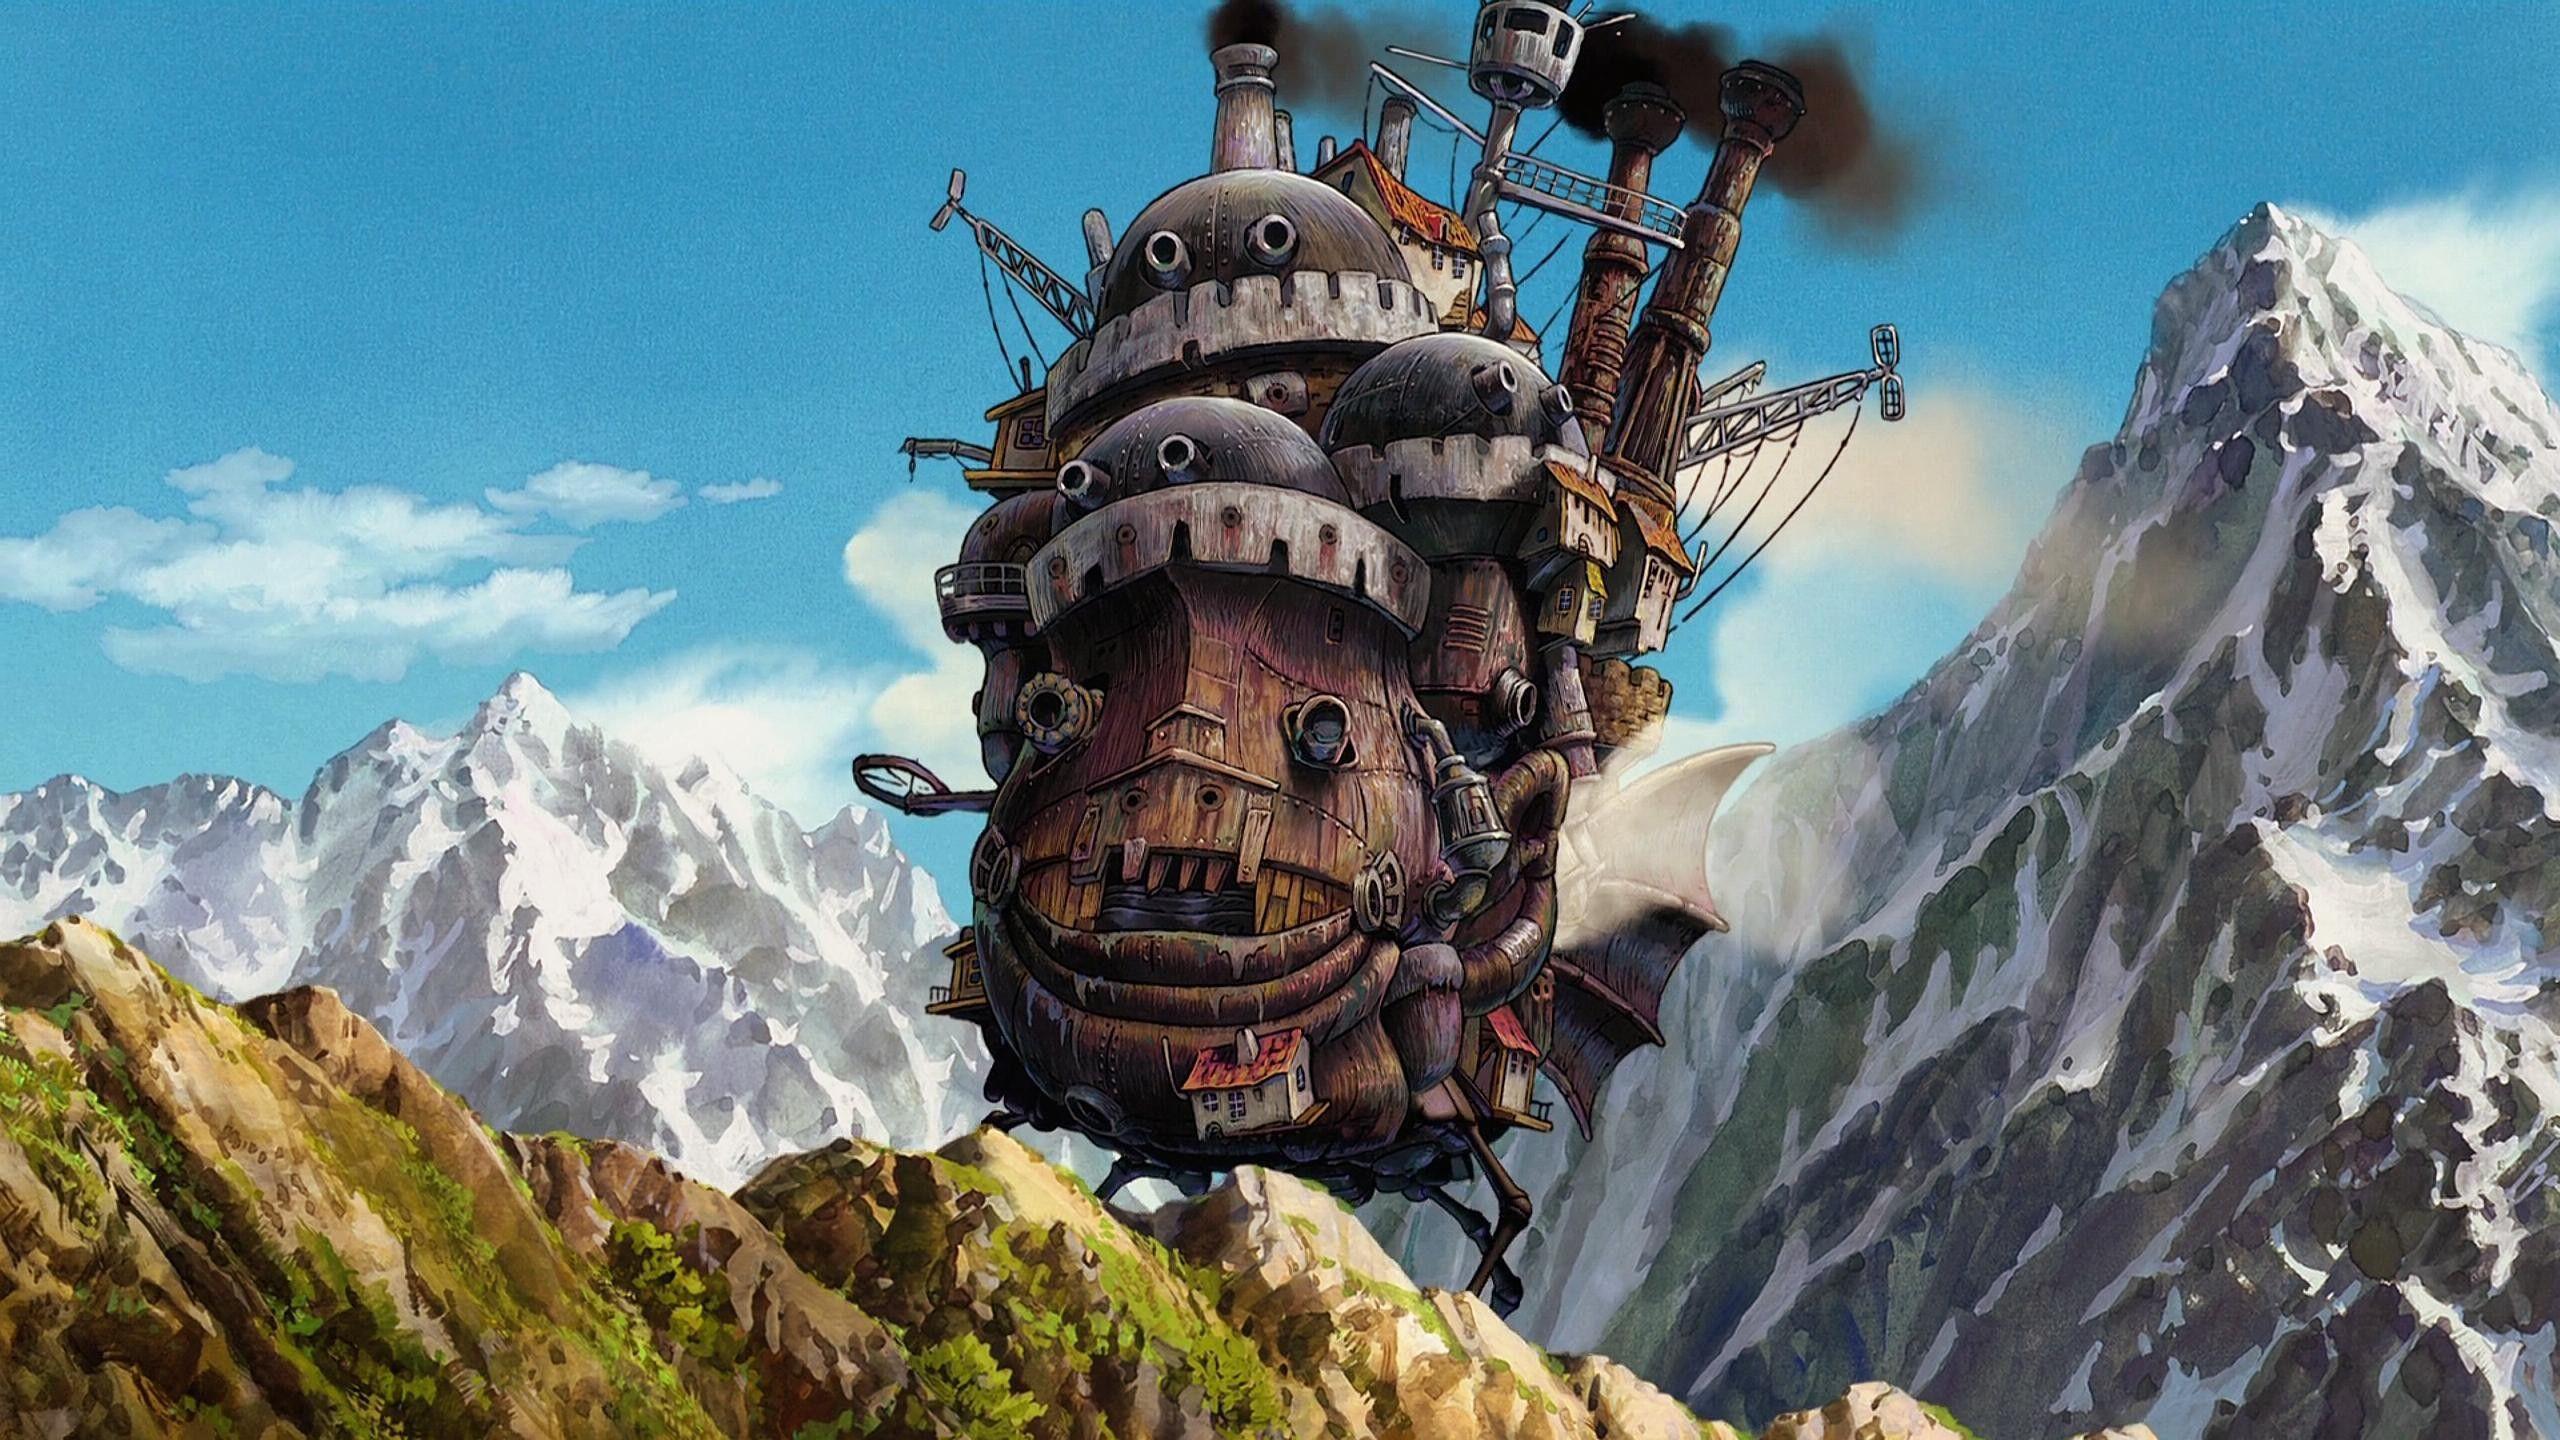 Studio Ghibli 4K Wallpapers - Top Free Studio Ghibli 4K ...